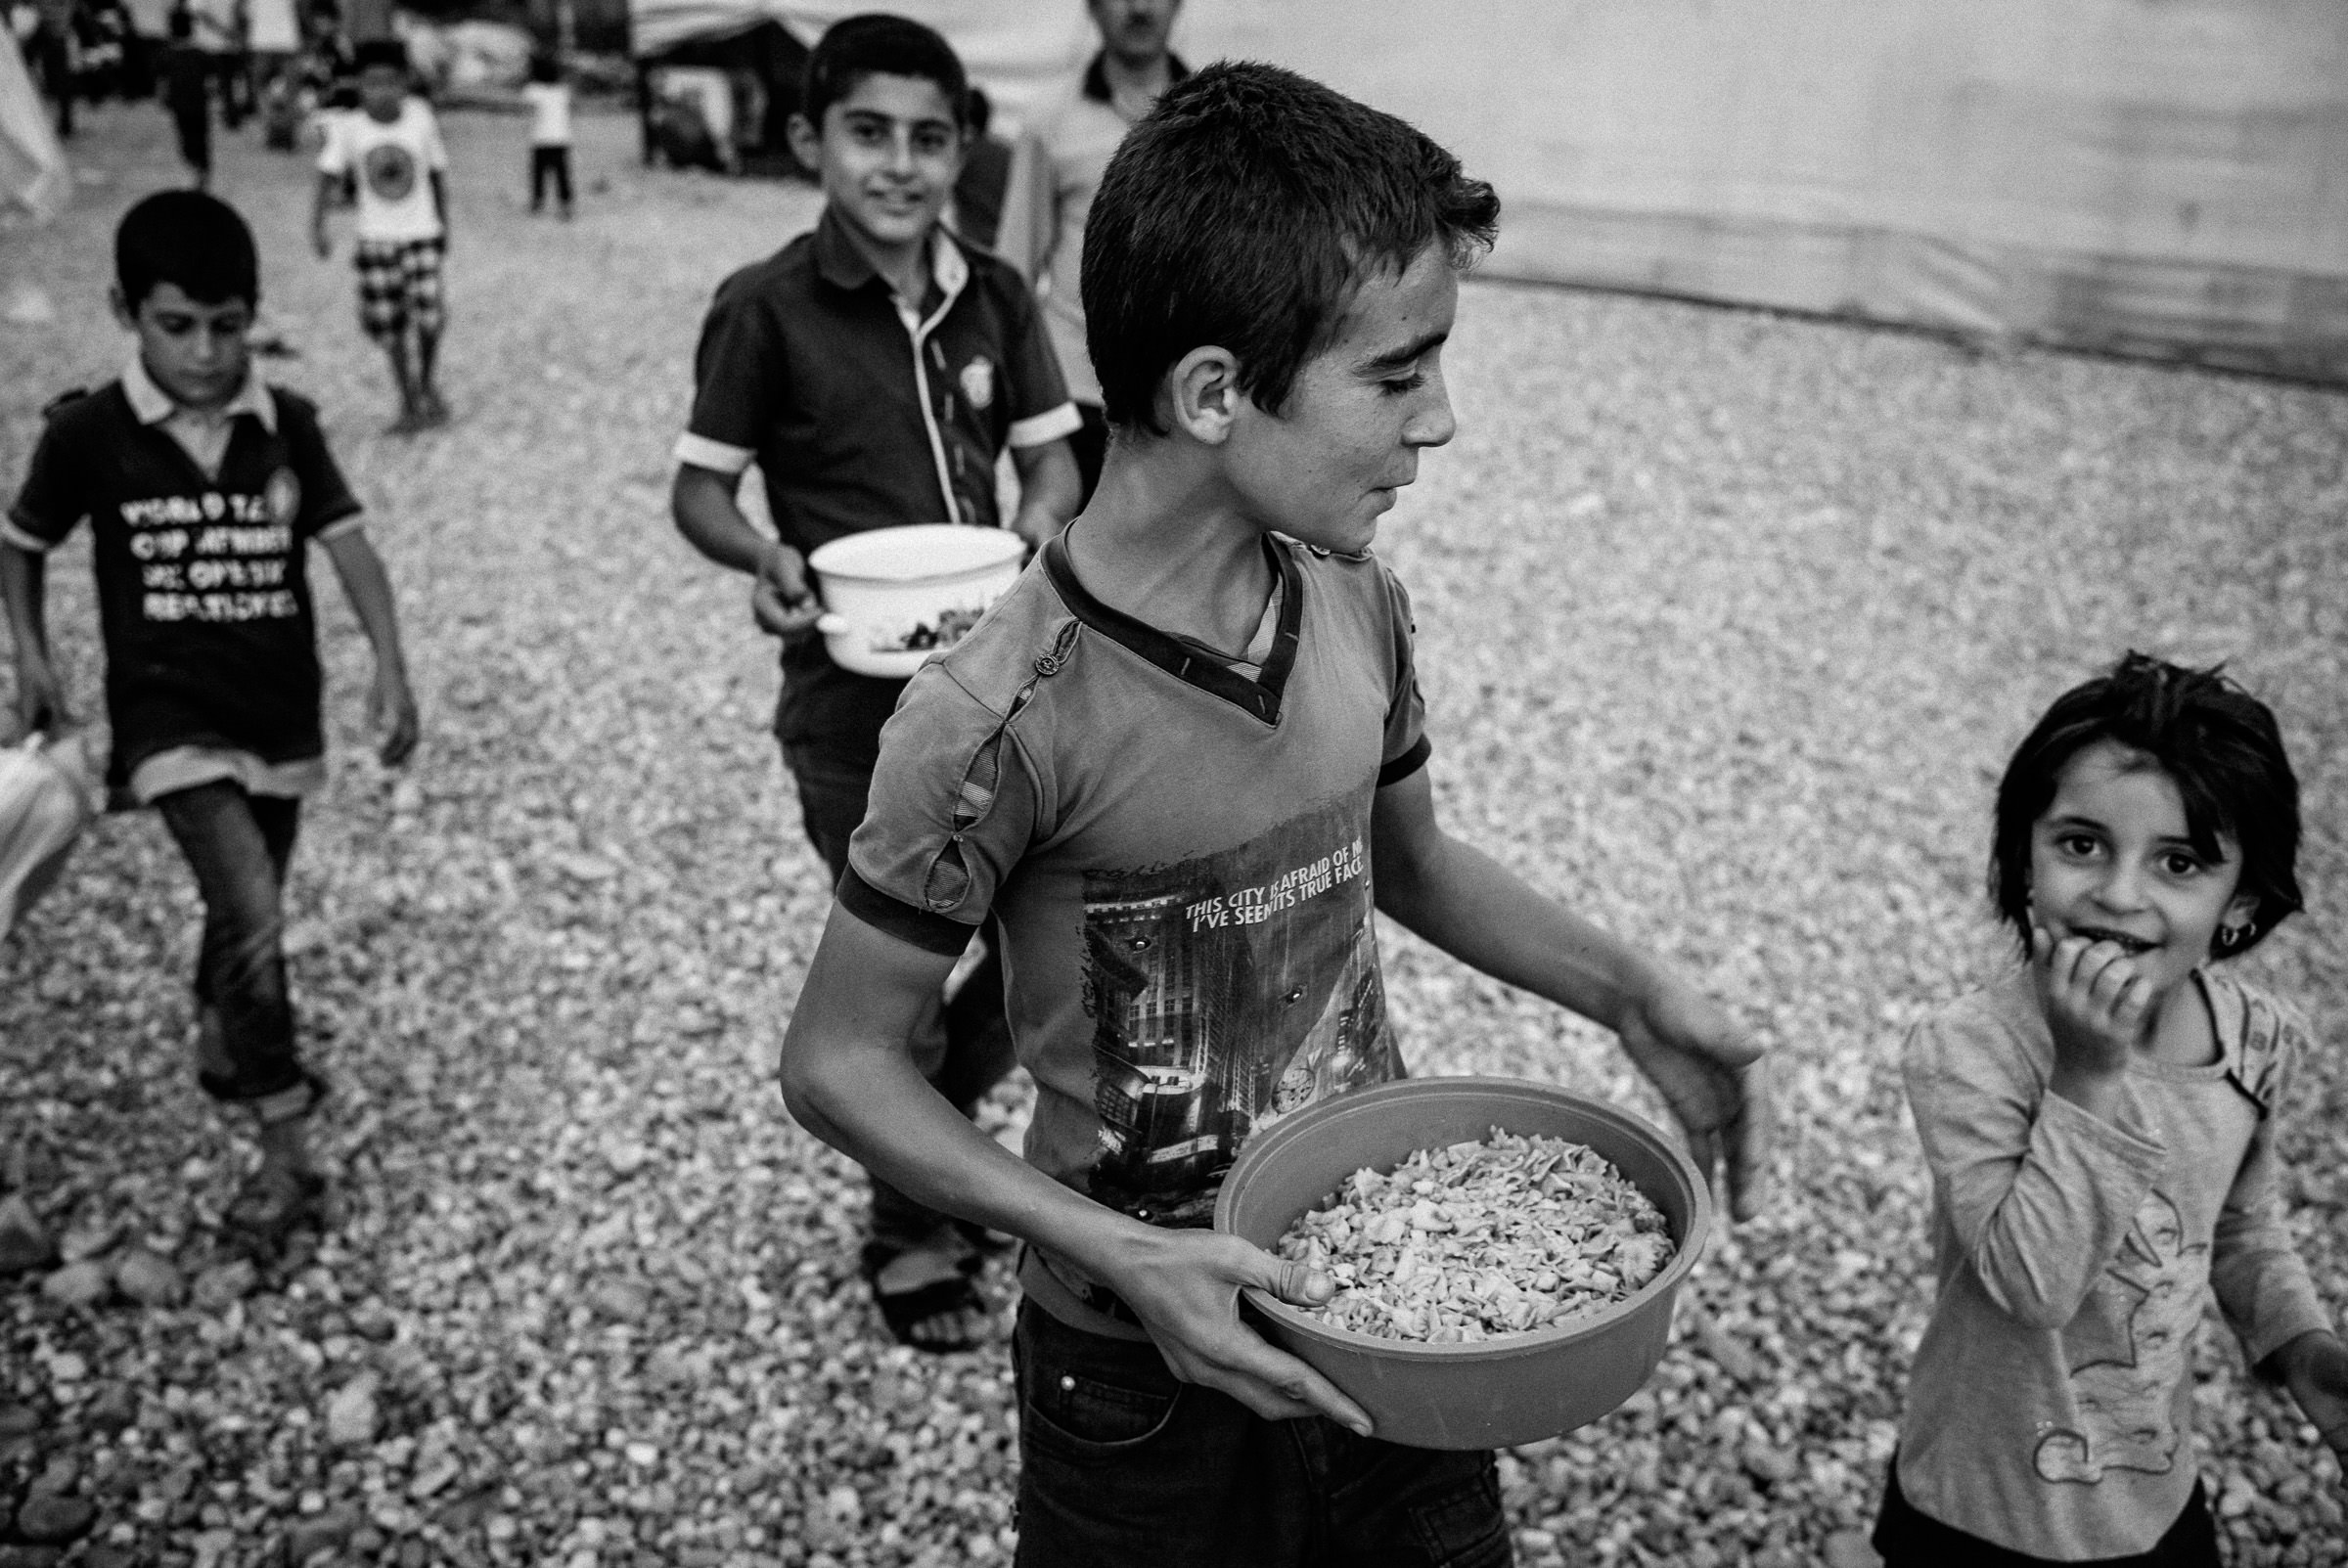 brandon_patoc_travel_photographer_in_turkey_0028.jpg